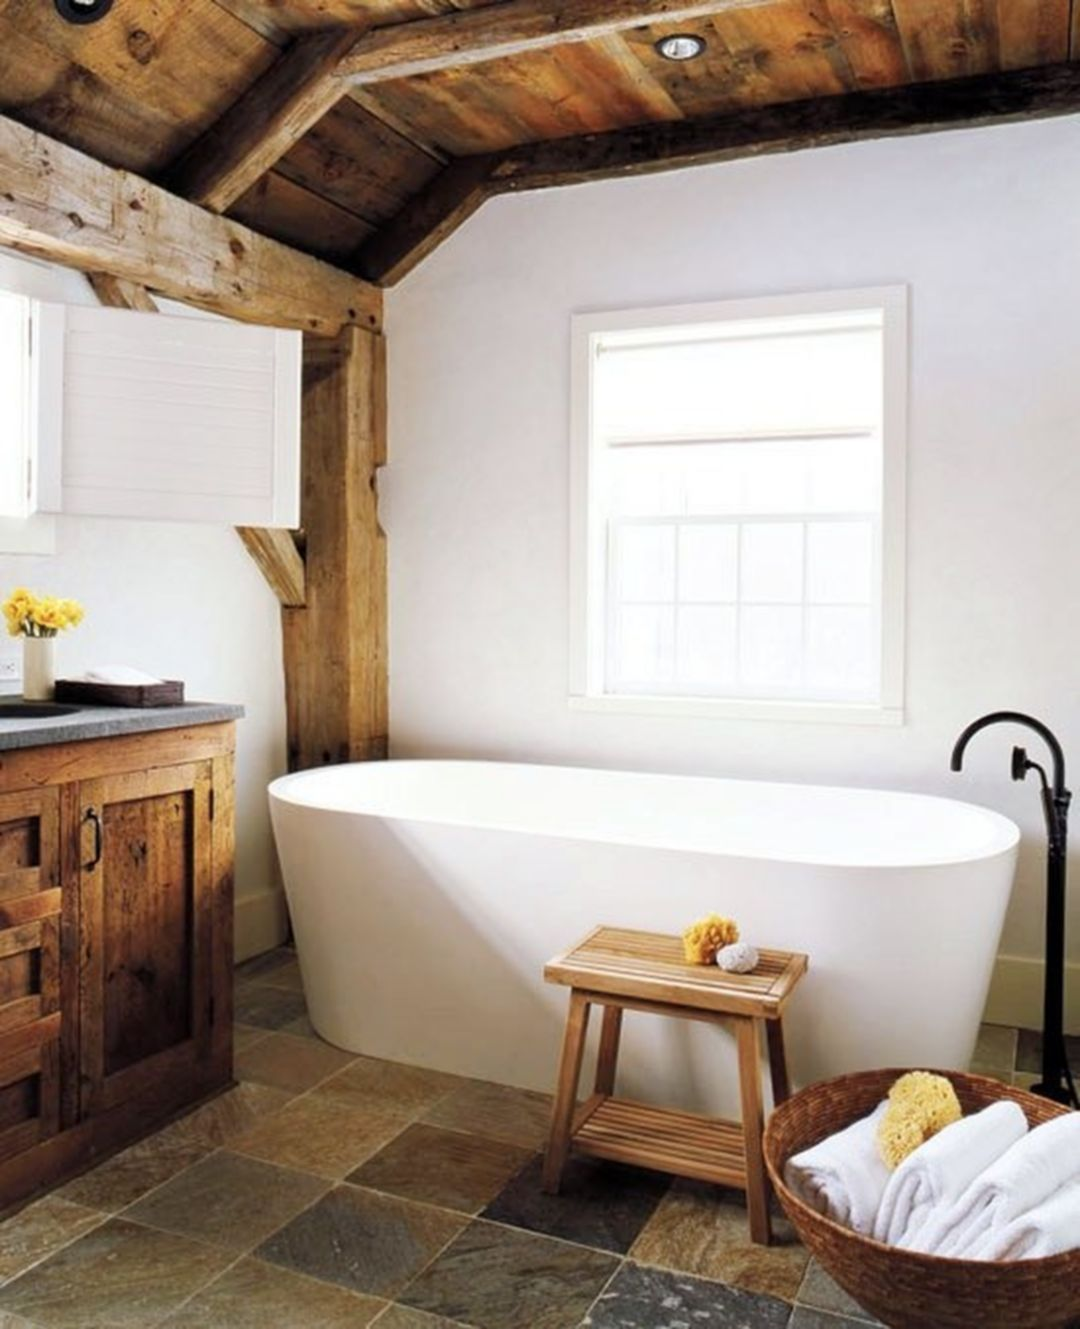 15 Enchanting Modern Rustic Bathroom Design Style You Should Have It ...